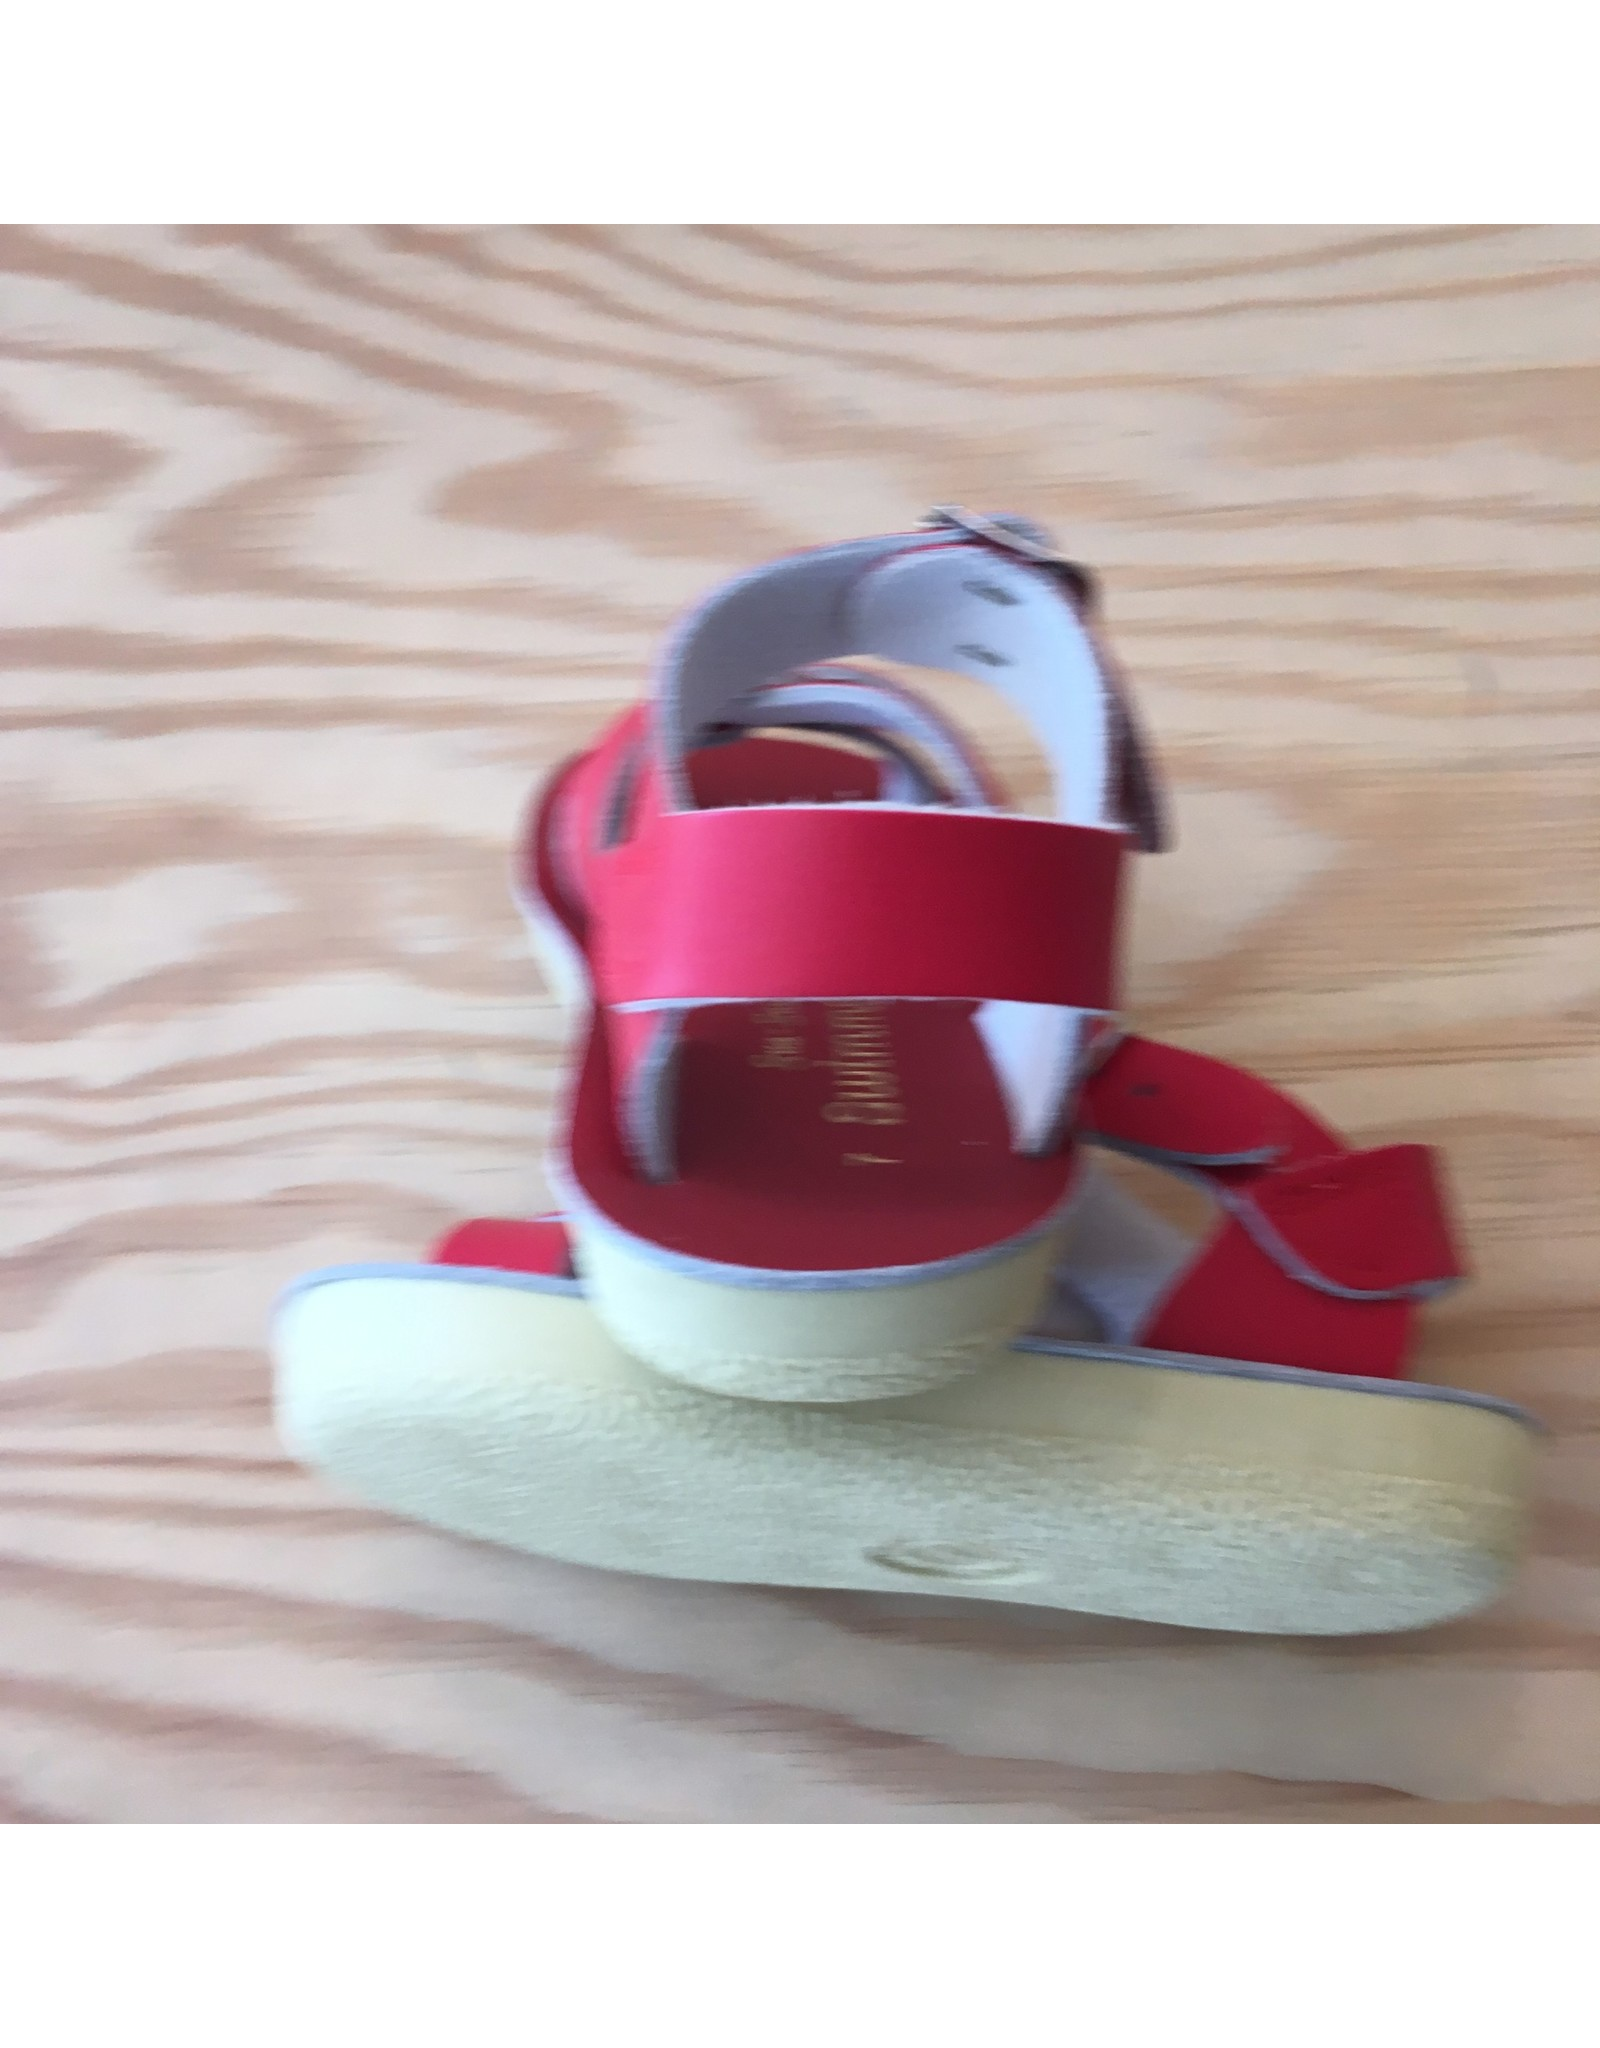 SALT-WATER SANDALS CLASSICS! SALT-WATER SANDALS SWIMMER RED